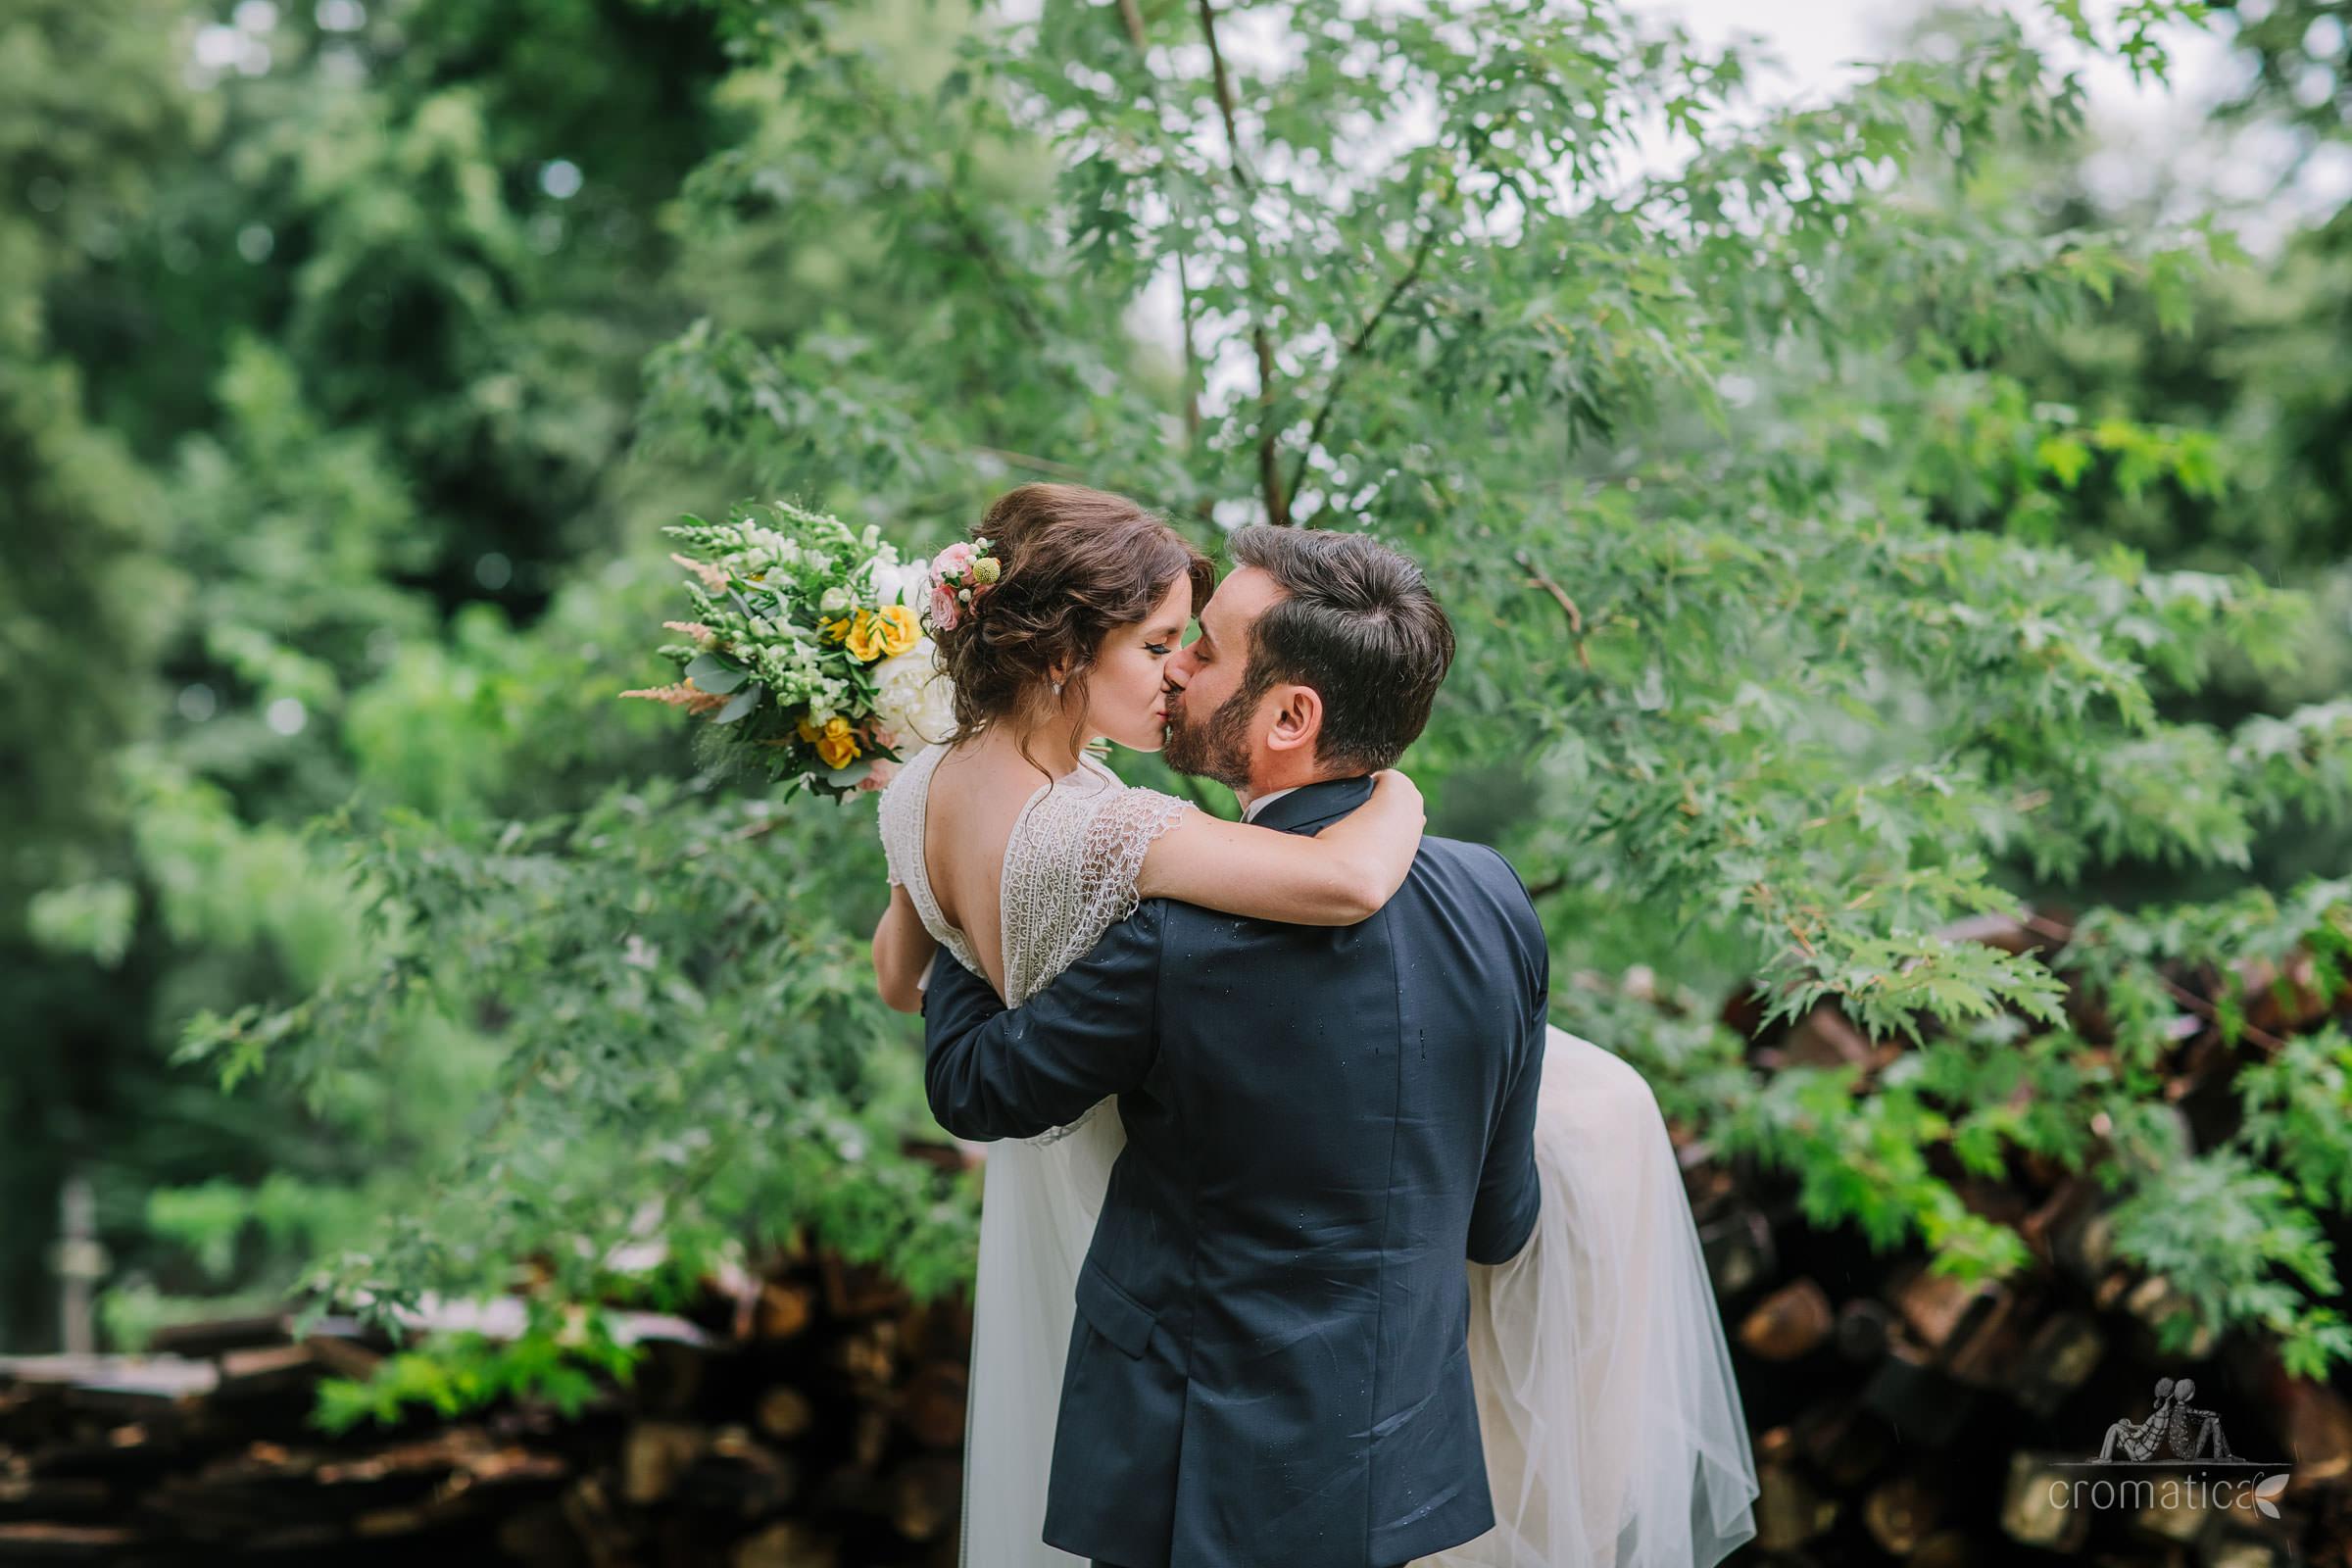 roxana mihai fotografii nunta la seratta 046